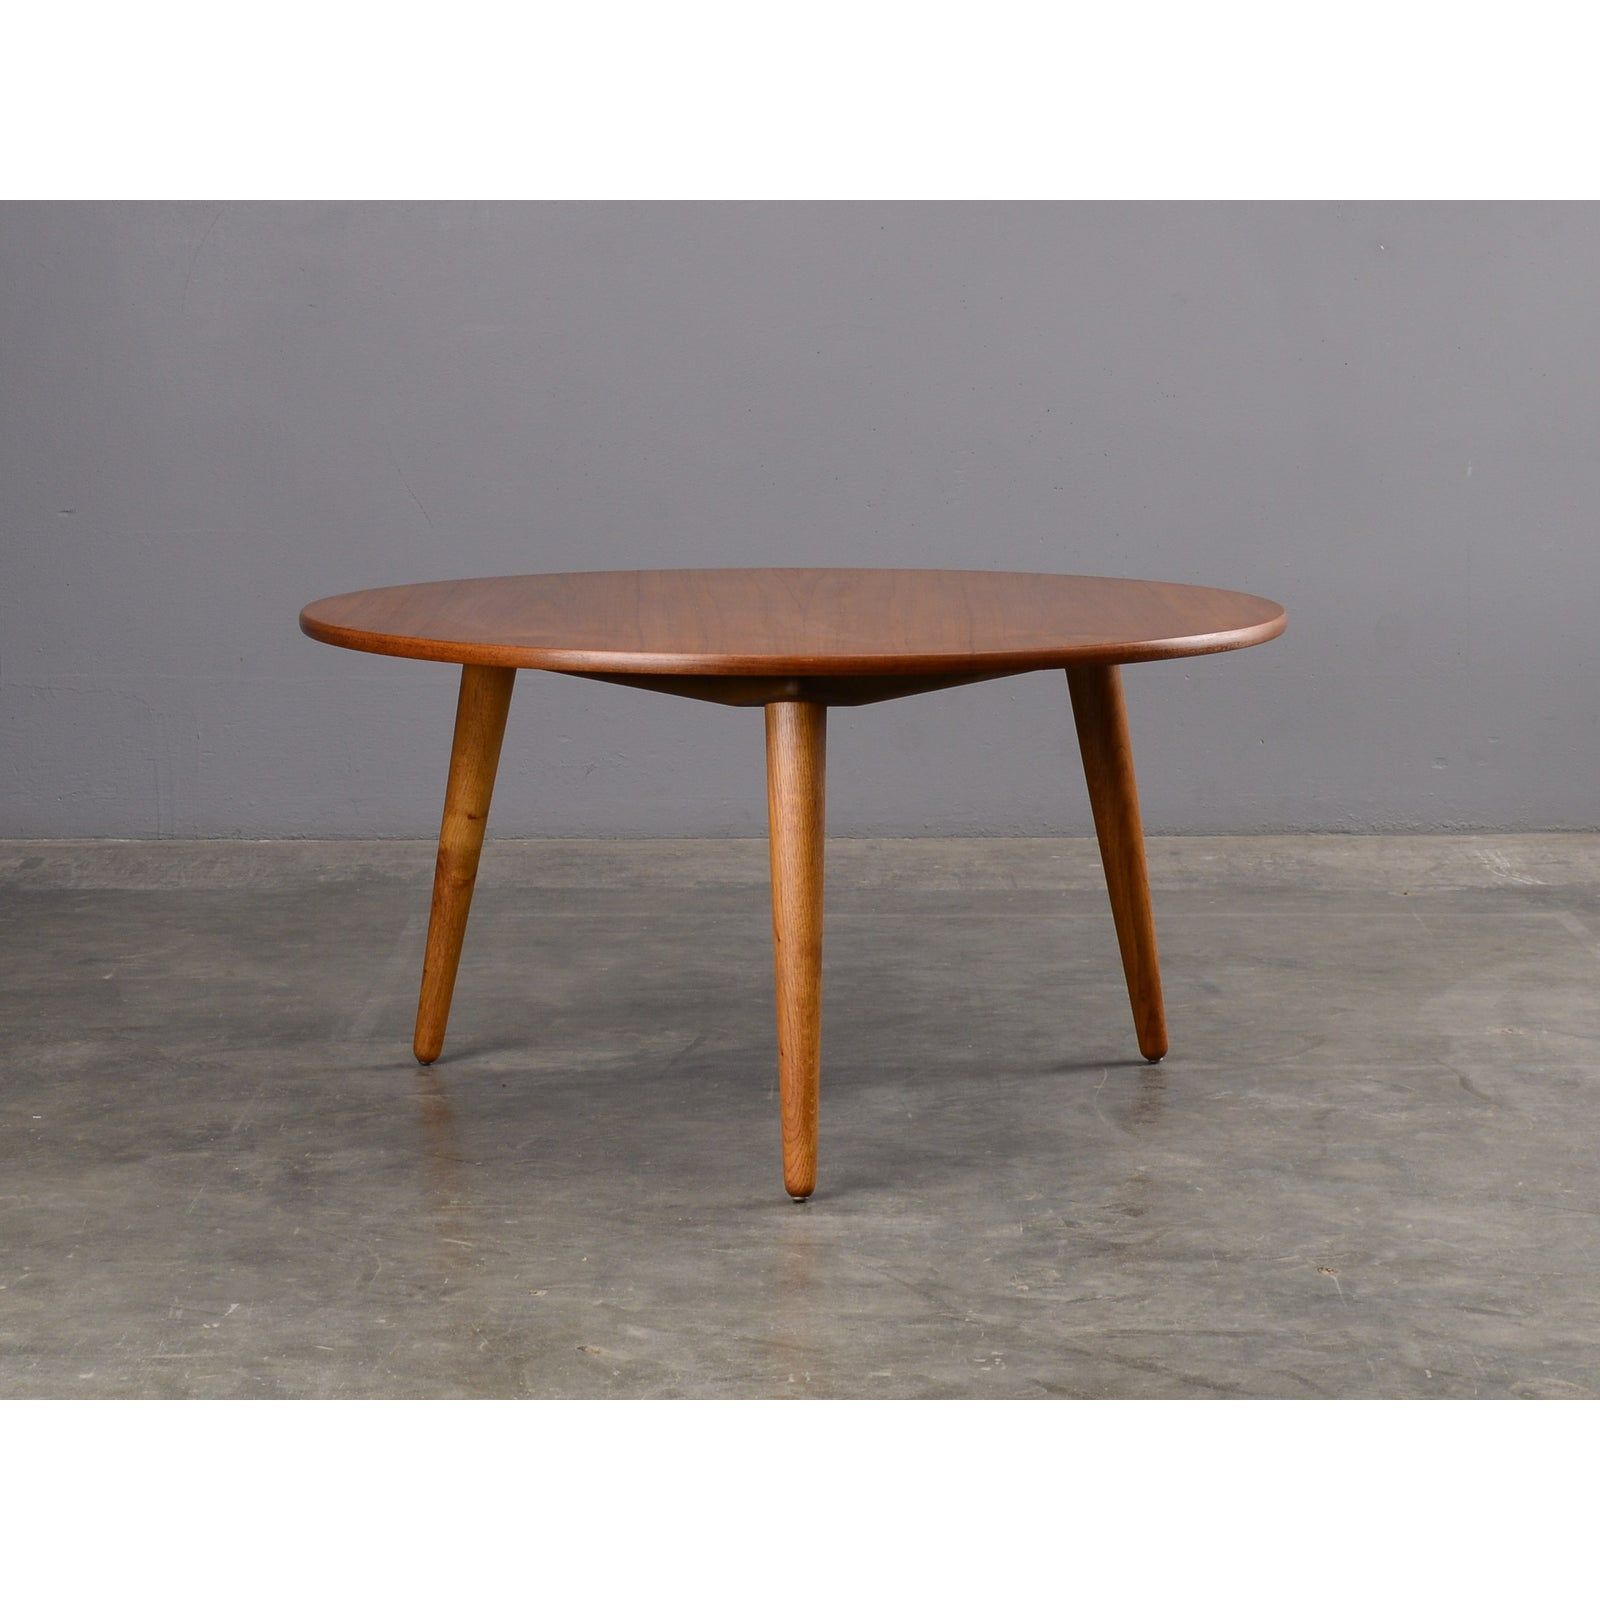 1950 S Danish Modern Hans Wegner Teak Round Coffee Table Teakdanishmodern Danish Modern Coffee Table Coffee Table Round Coffee Table [ 1600 x 1600 Pixel ]